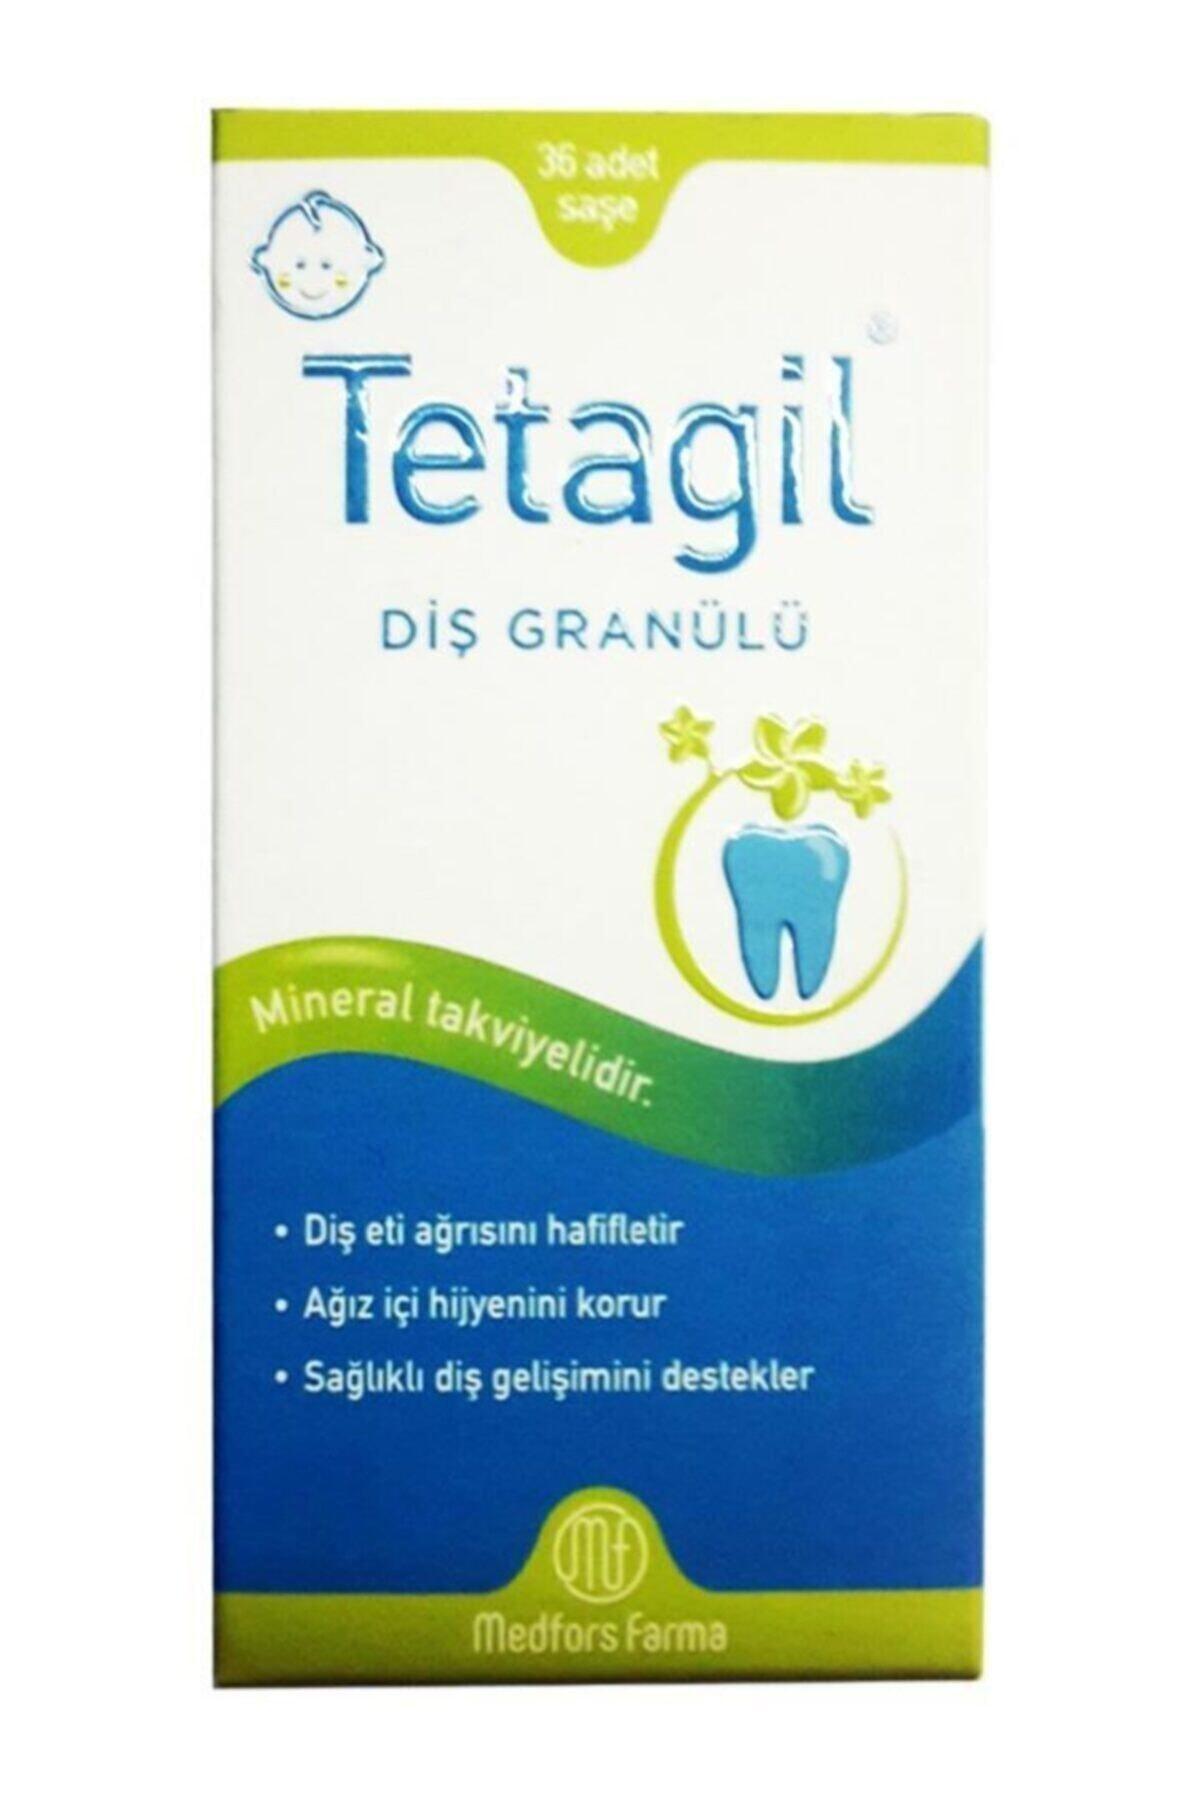 Medfors Farma Tetagil Diş Granülü 36 Saşe 1